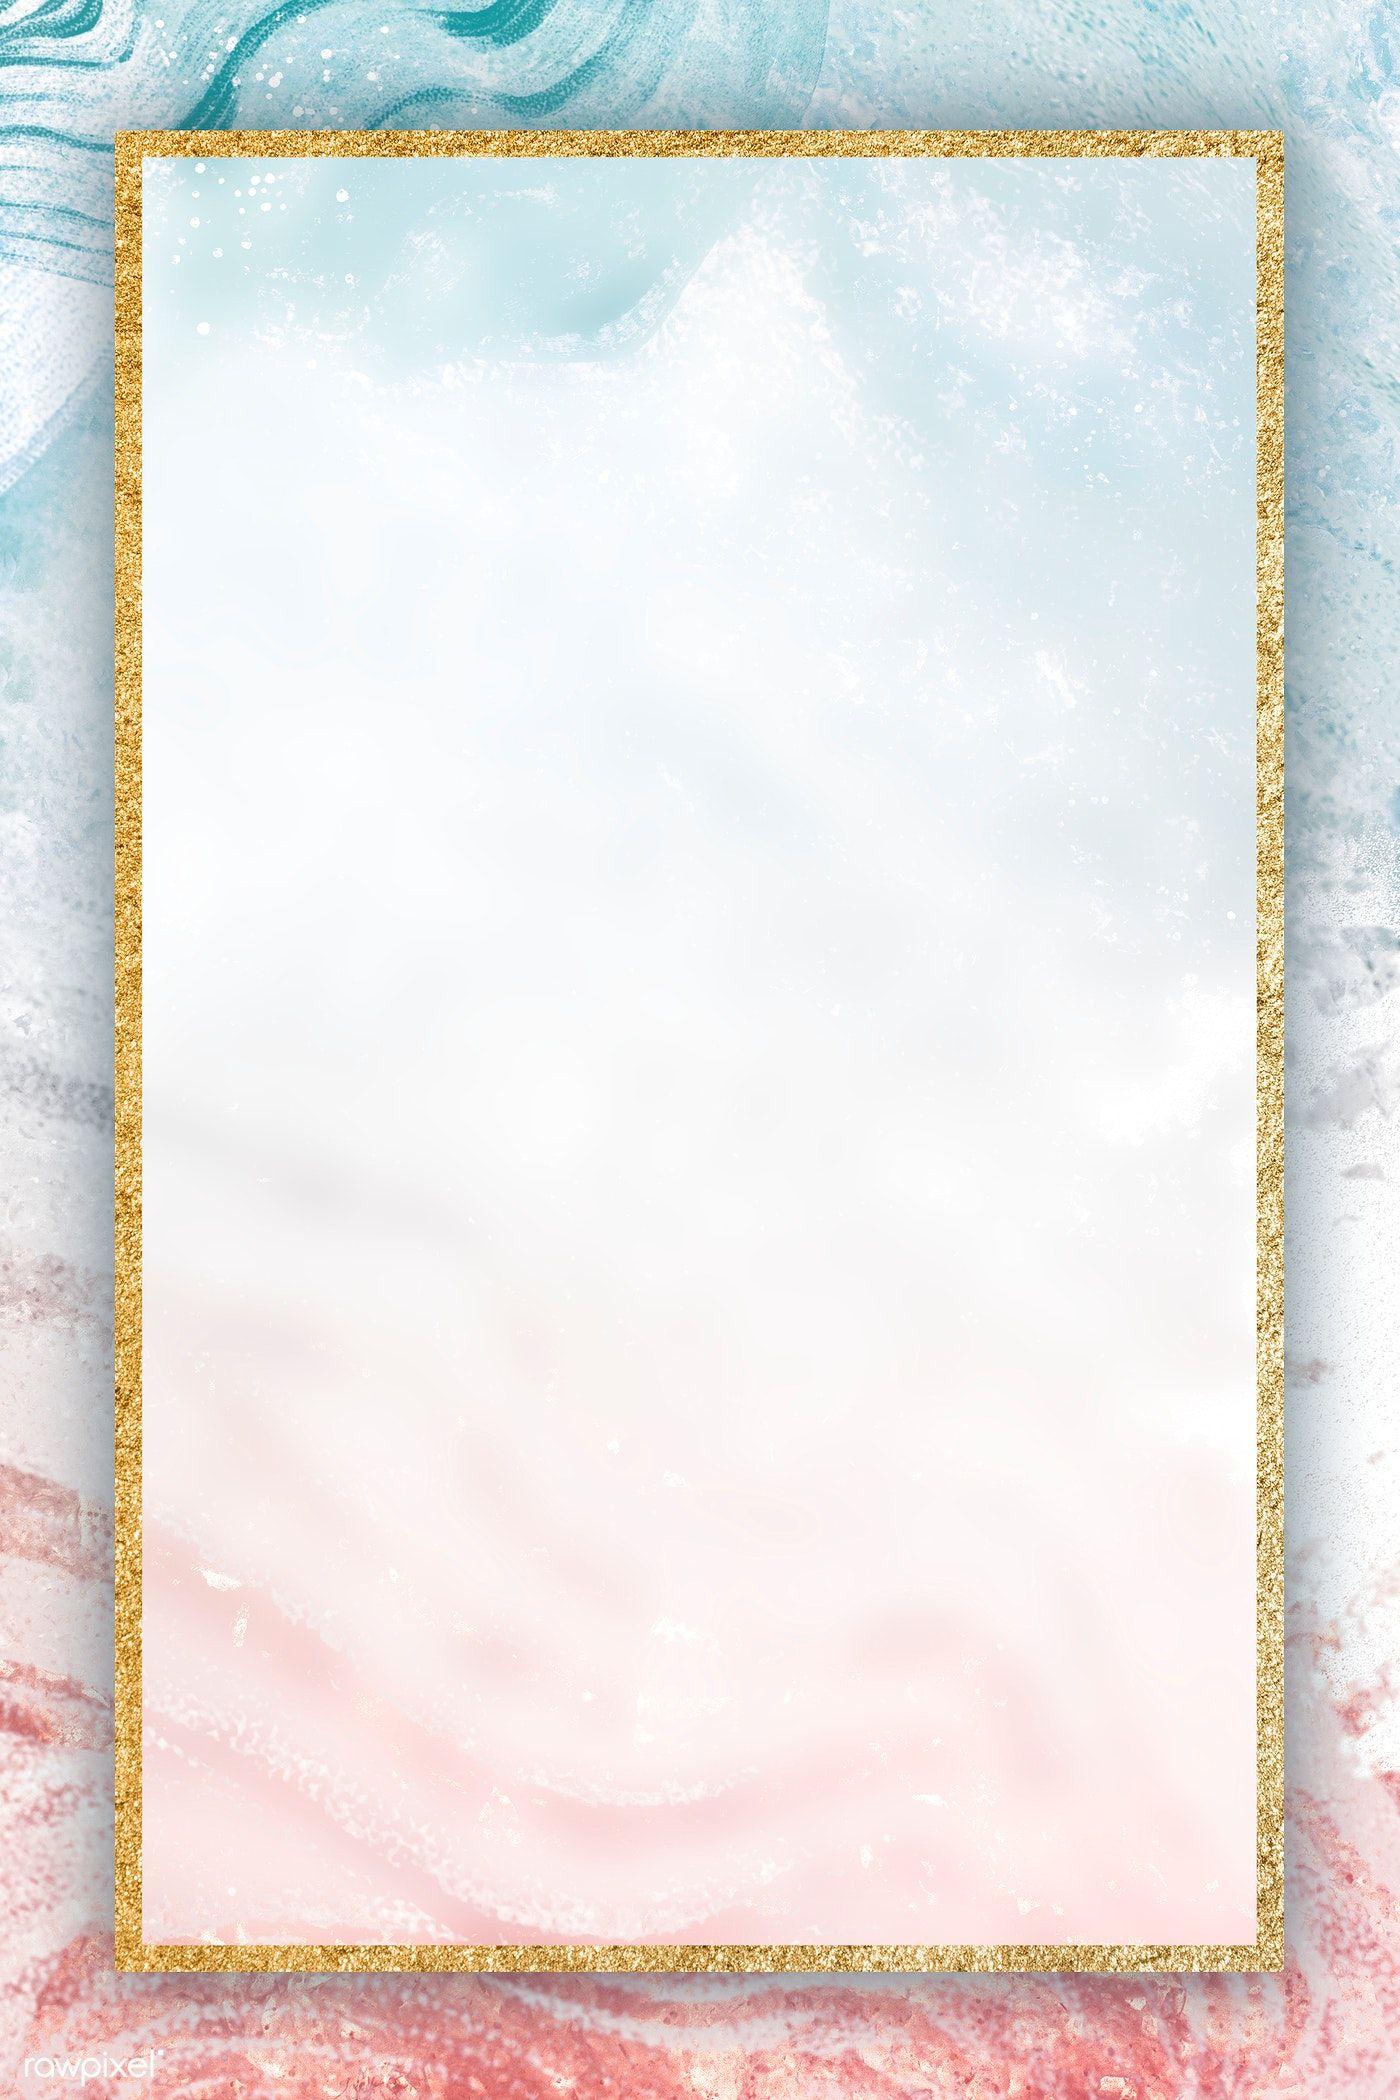 Download Premium Illustration Of Gold Frame On Neo Memphis Social Gold Wallpaper Background Paper Background Texture Nature Paper